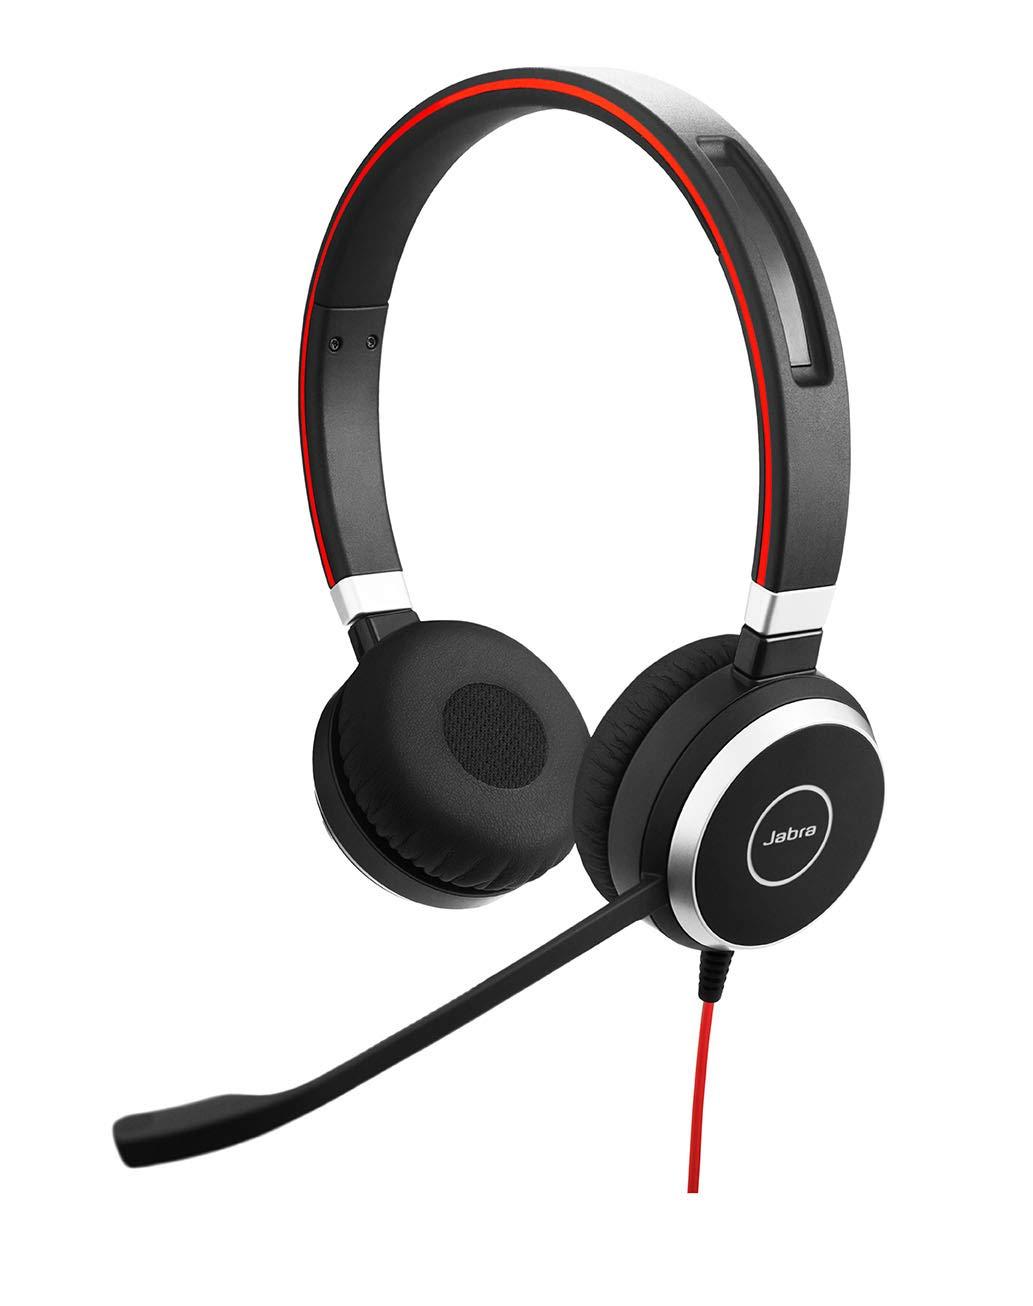 Jabra Evolve 40 UC headphones